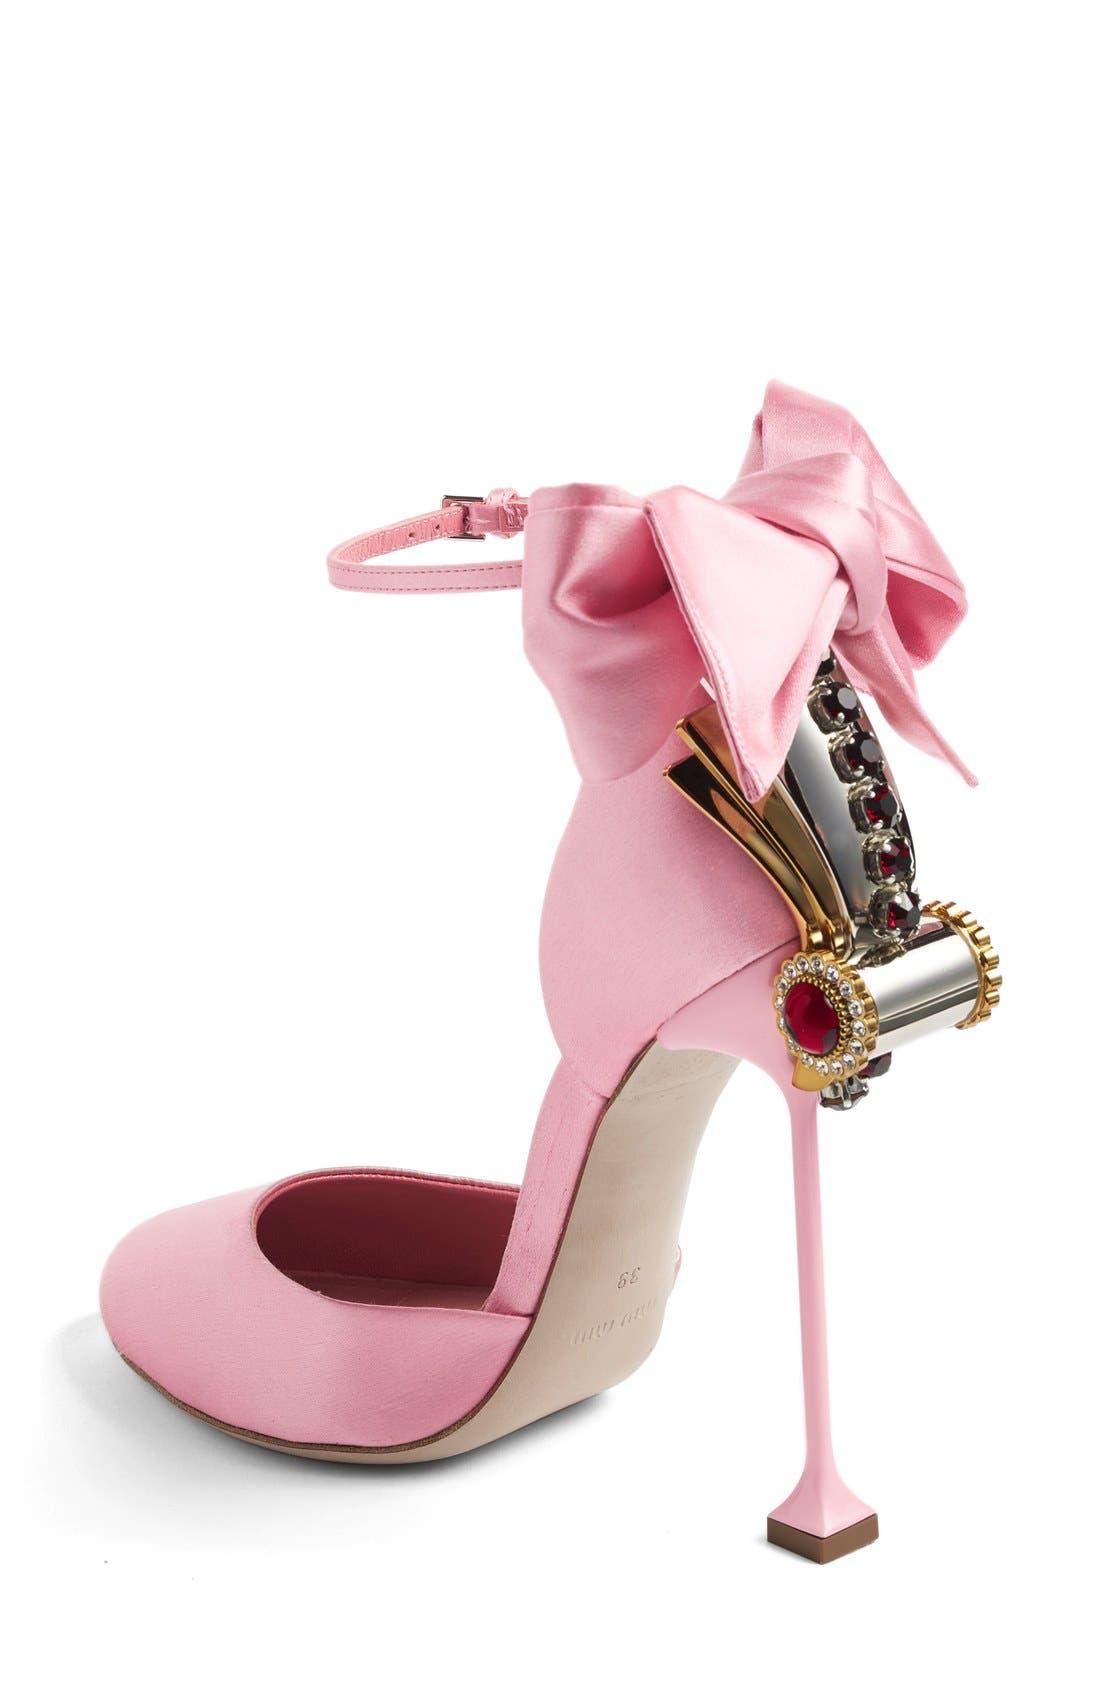 MIU MIU,                             Crystal Bow Tie Ankle Strap Pump,                             Alternate thumbnail 3, color,                             650